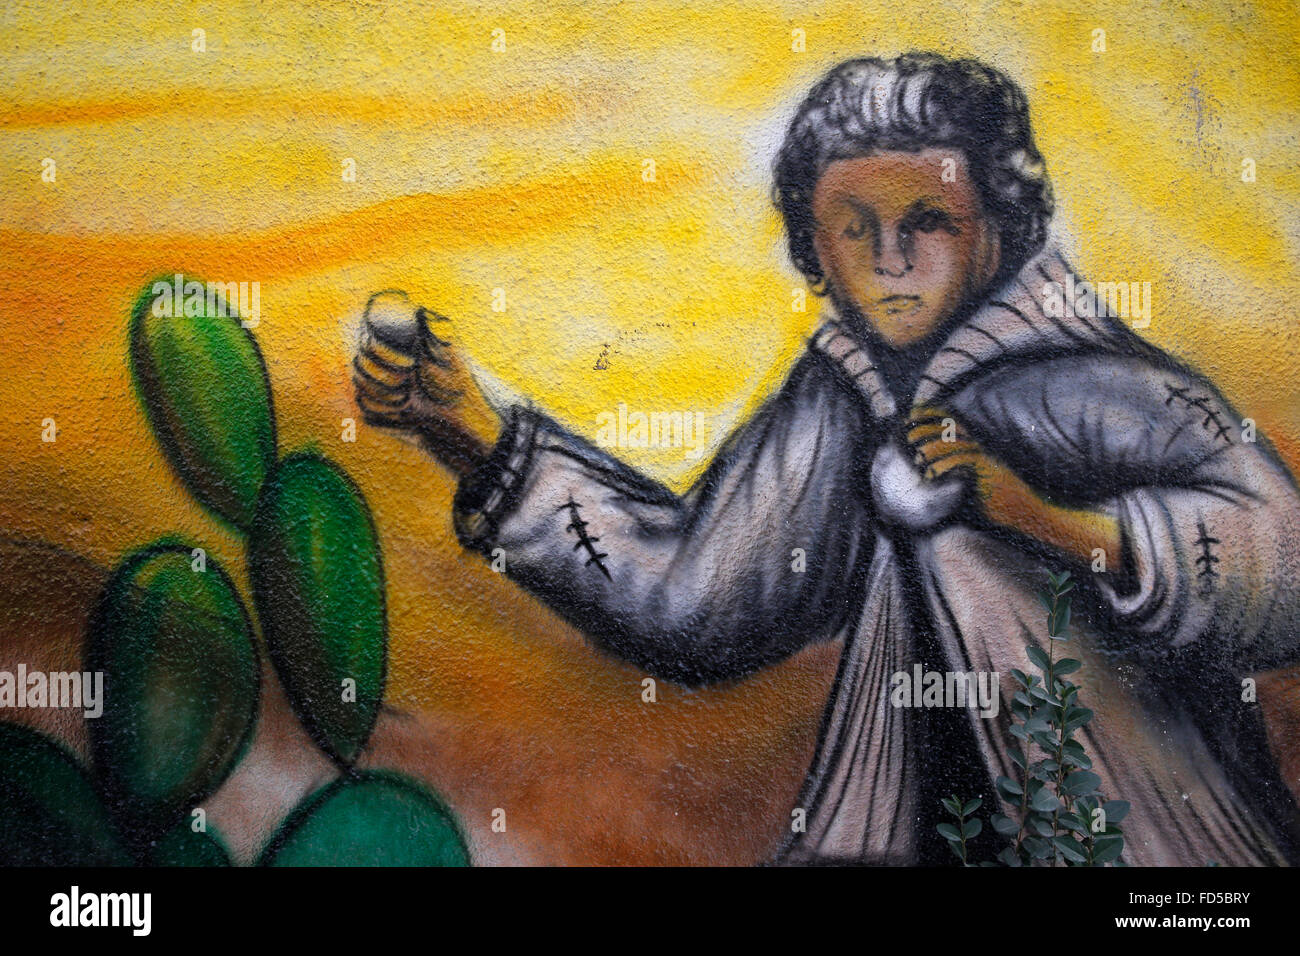 Wall art near Qalandiya refugee camp, West Bank, Palestine Stock ...